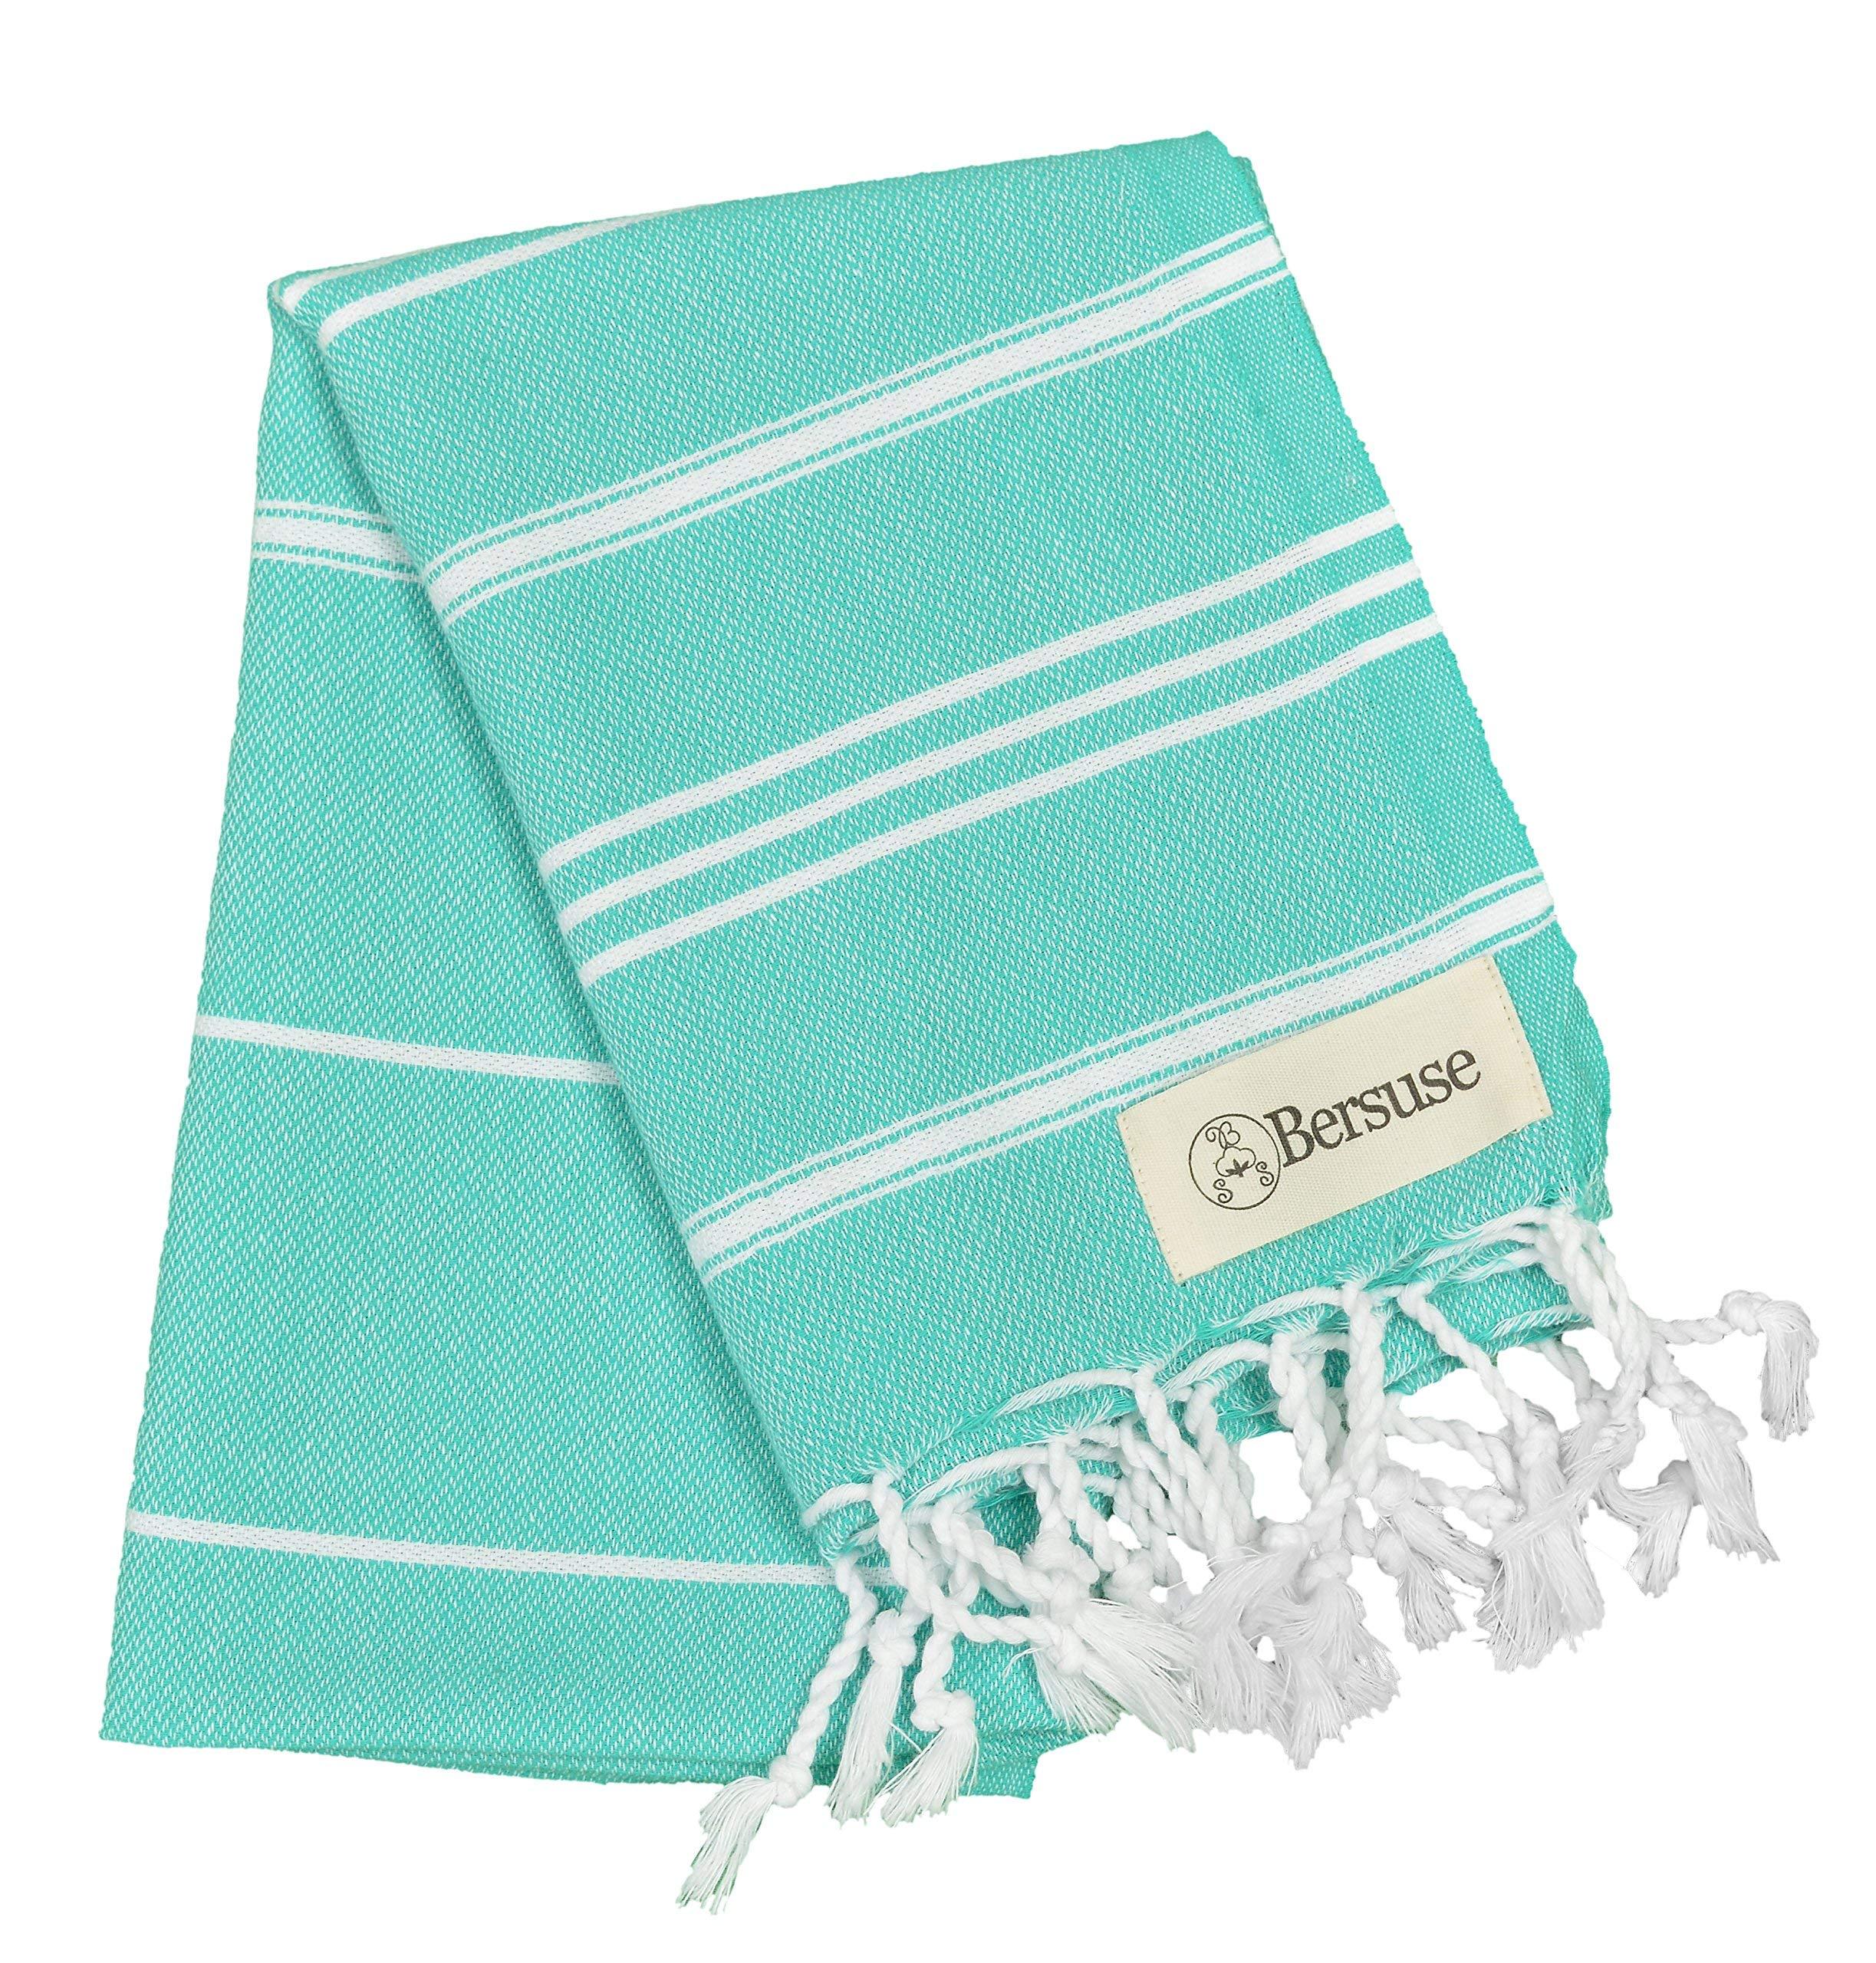 Bersuse 100% Cotton - Anatolia Hand Turkish Towel Pestemal - Baby Care Kitchen Tea Dish Washcloth - Travel Gym Head Hair Face Peshtemal - Classic Striped - 22X35 Inches, Mint Green